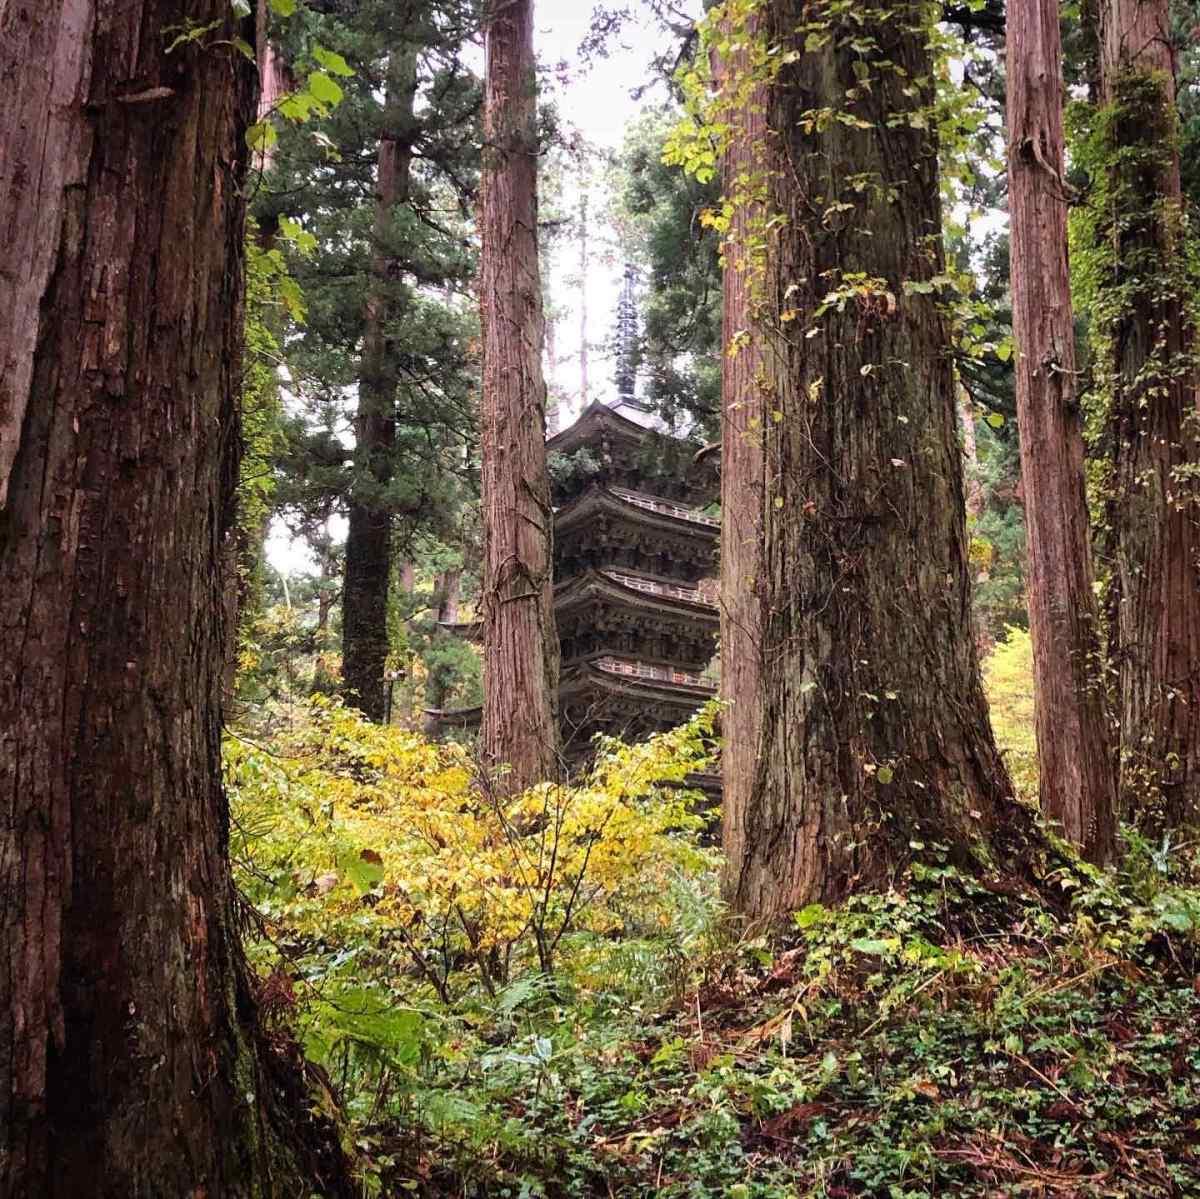 The Five Story Pagoda on Mt. Haguro